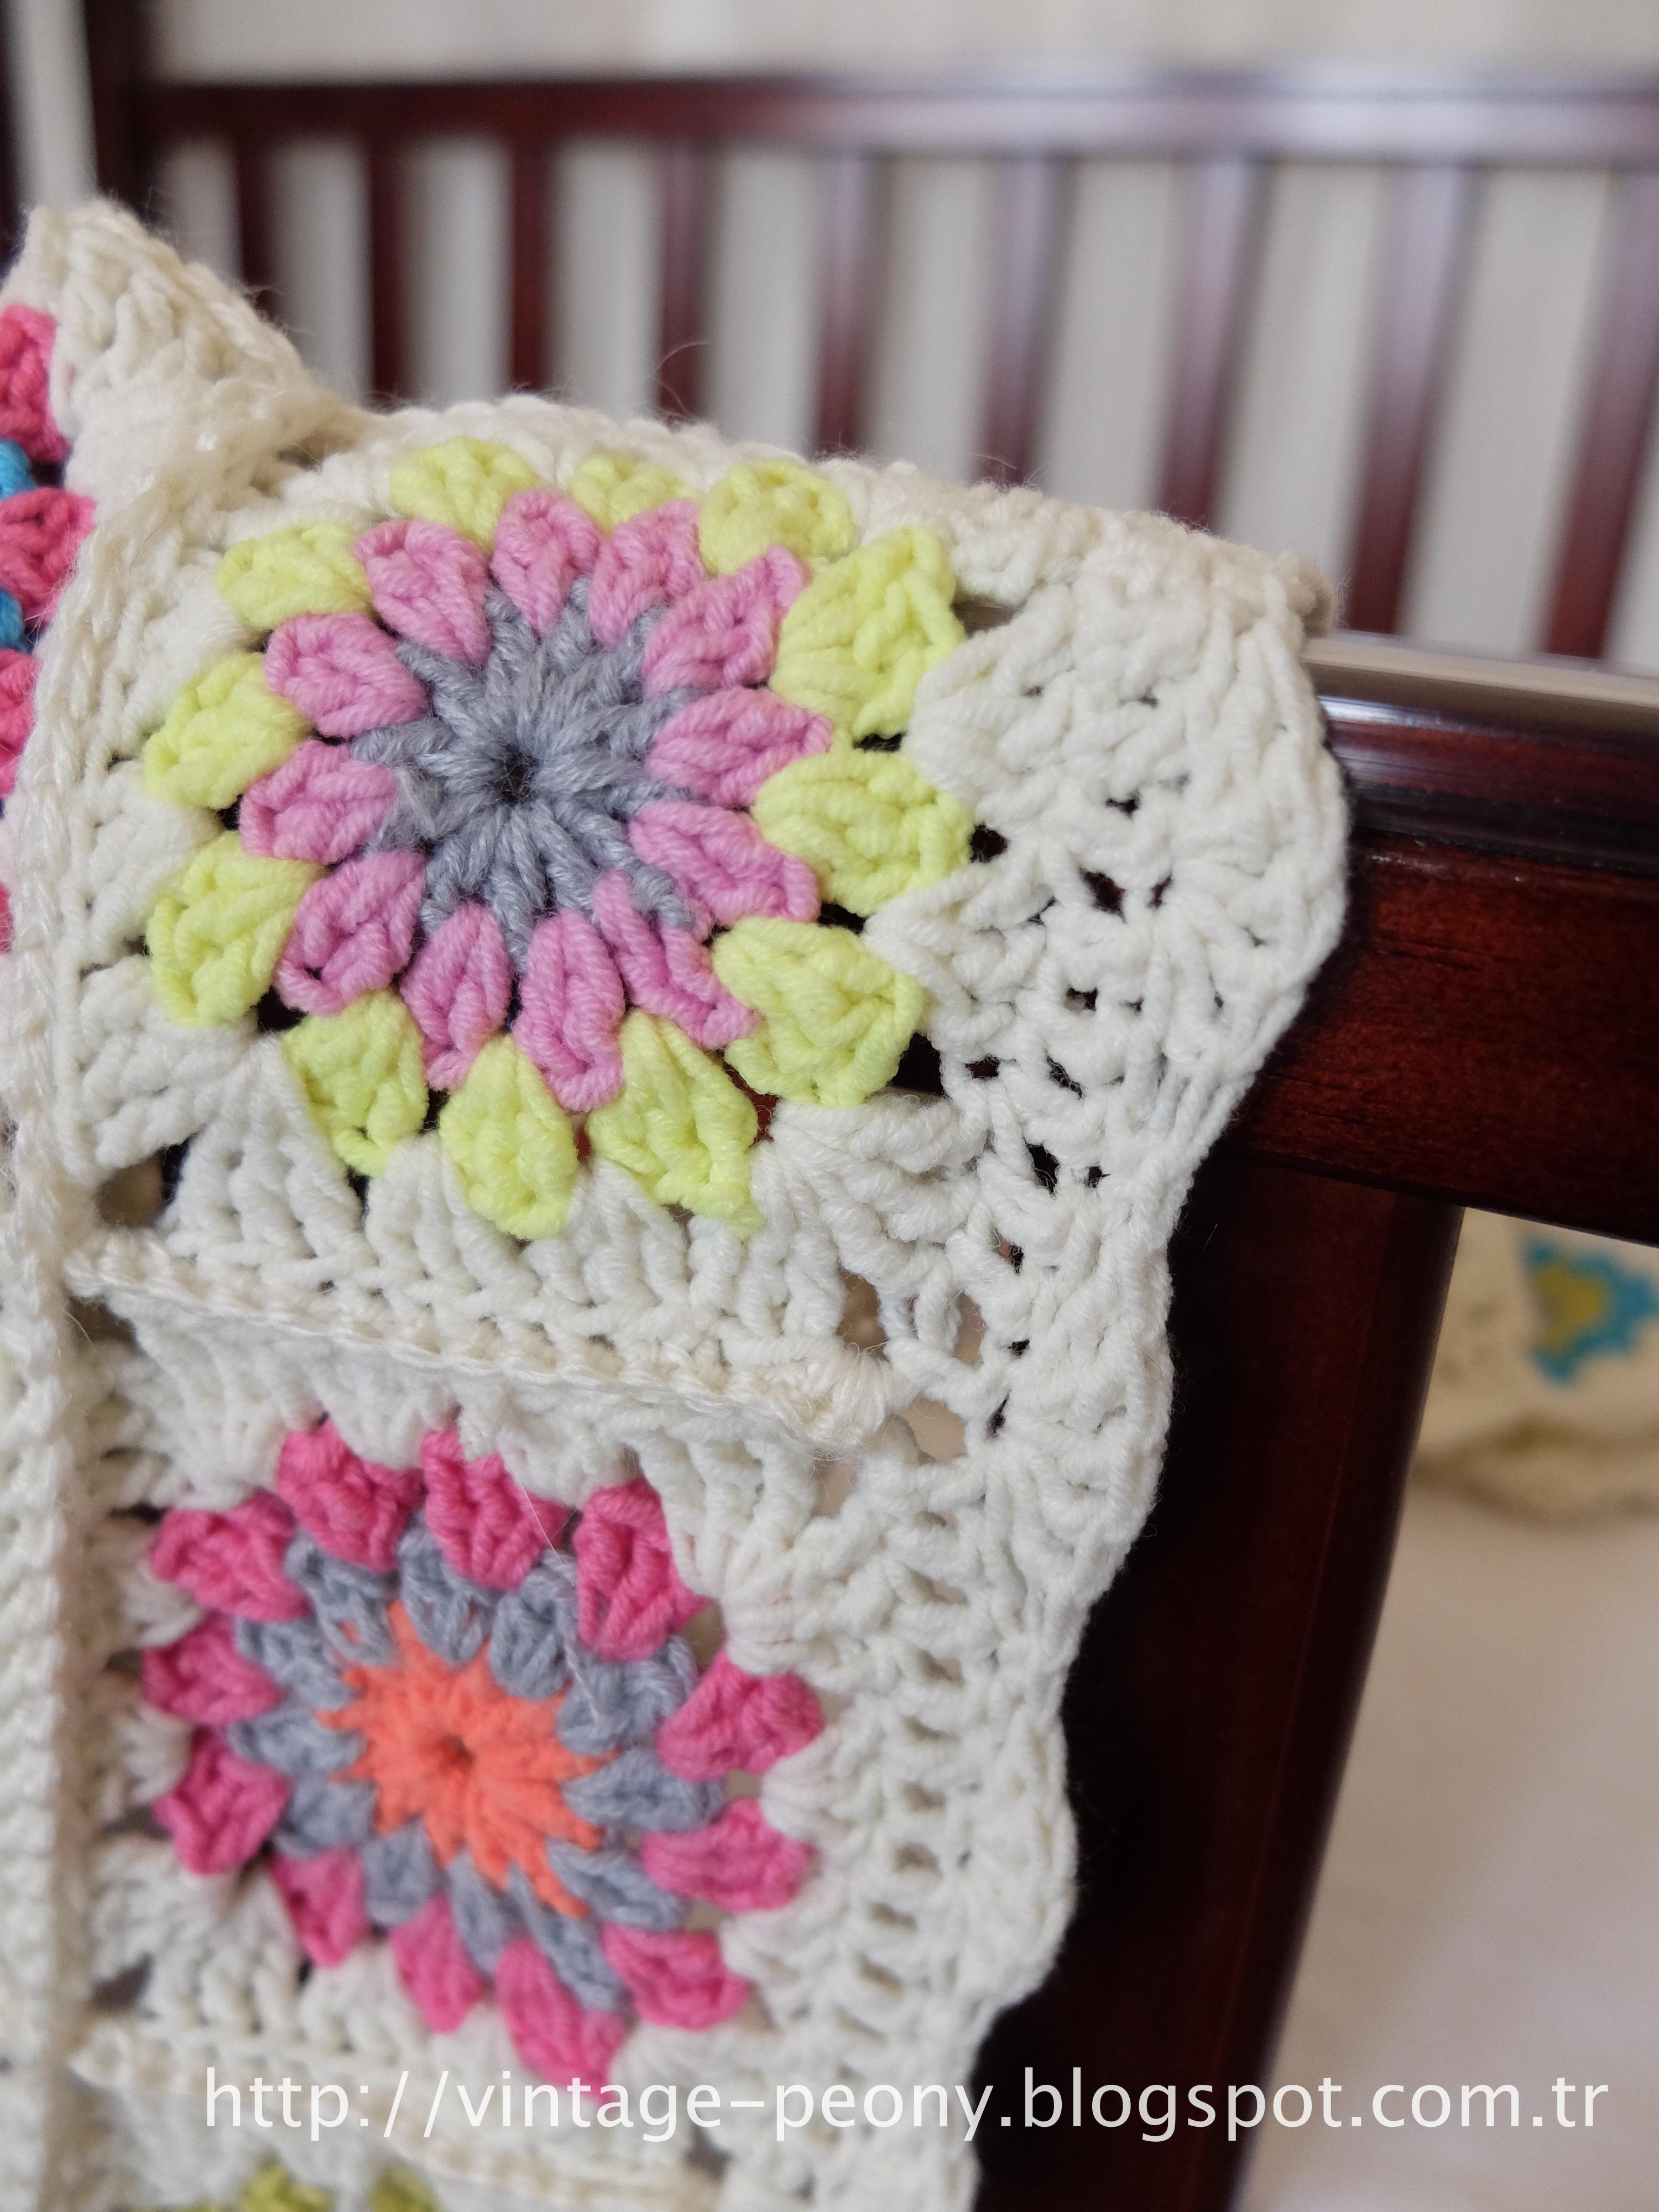 crochet granny squares afghan blanket